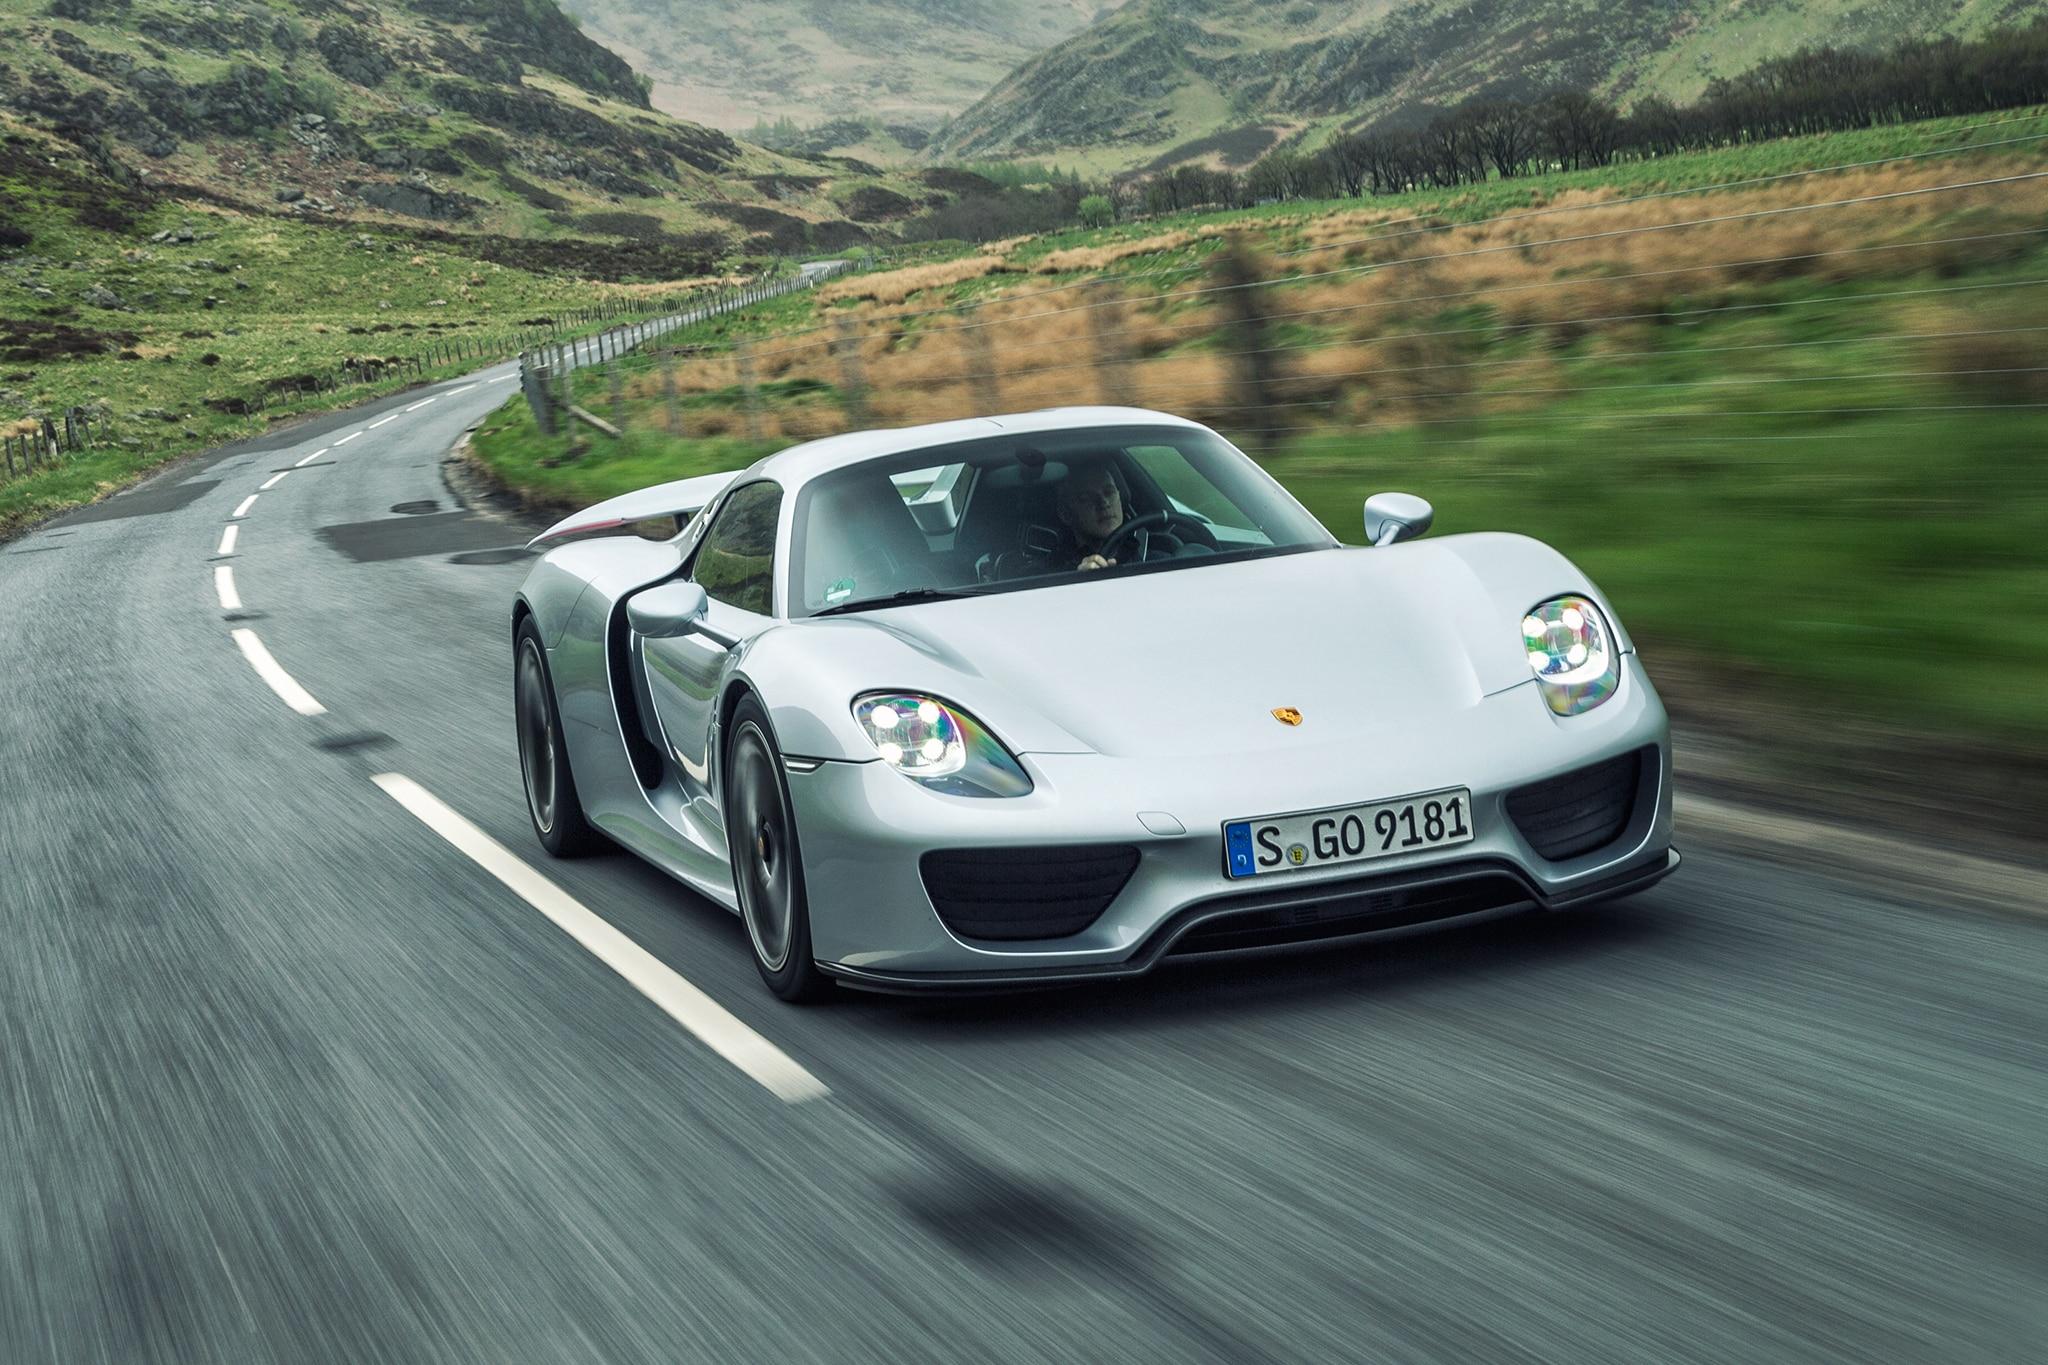 Porsche Led Headlights >> Porsche 918 Spyder Reimagined with a 2018 Facelift | Automobile Magazine